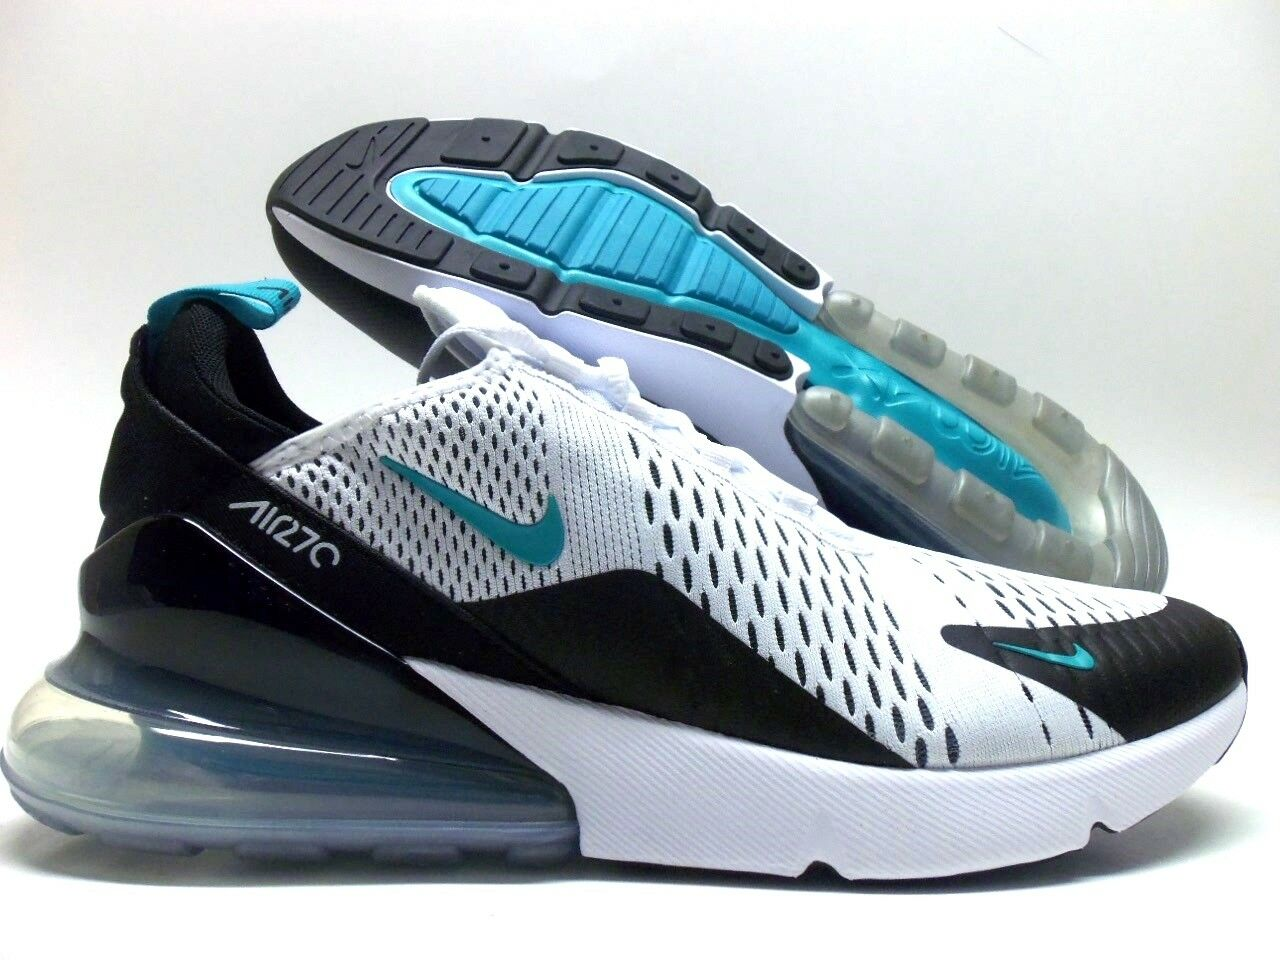 Nike air max 270 nero / white-dusty uomini cactus dimensioni uomini white-dusty 12 [ah8050-001] 481085